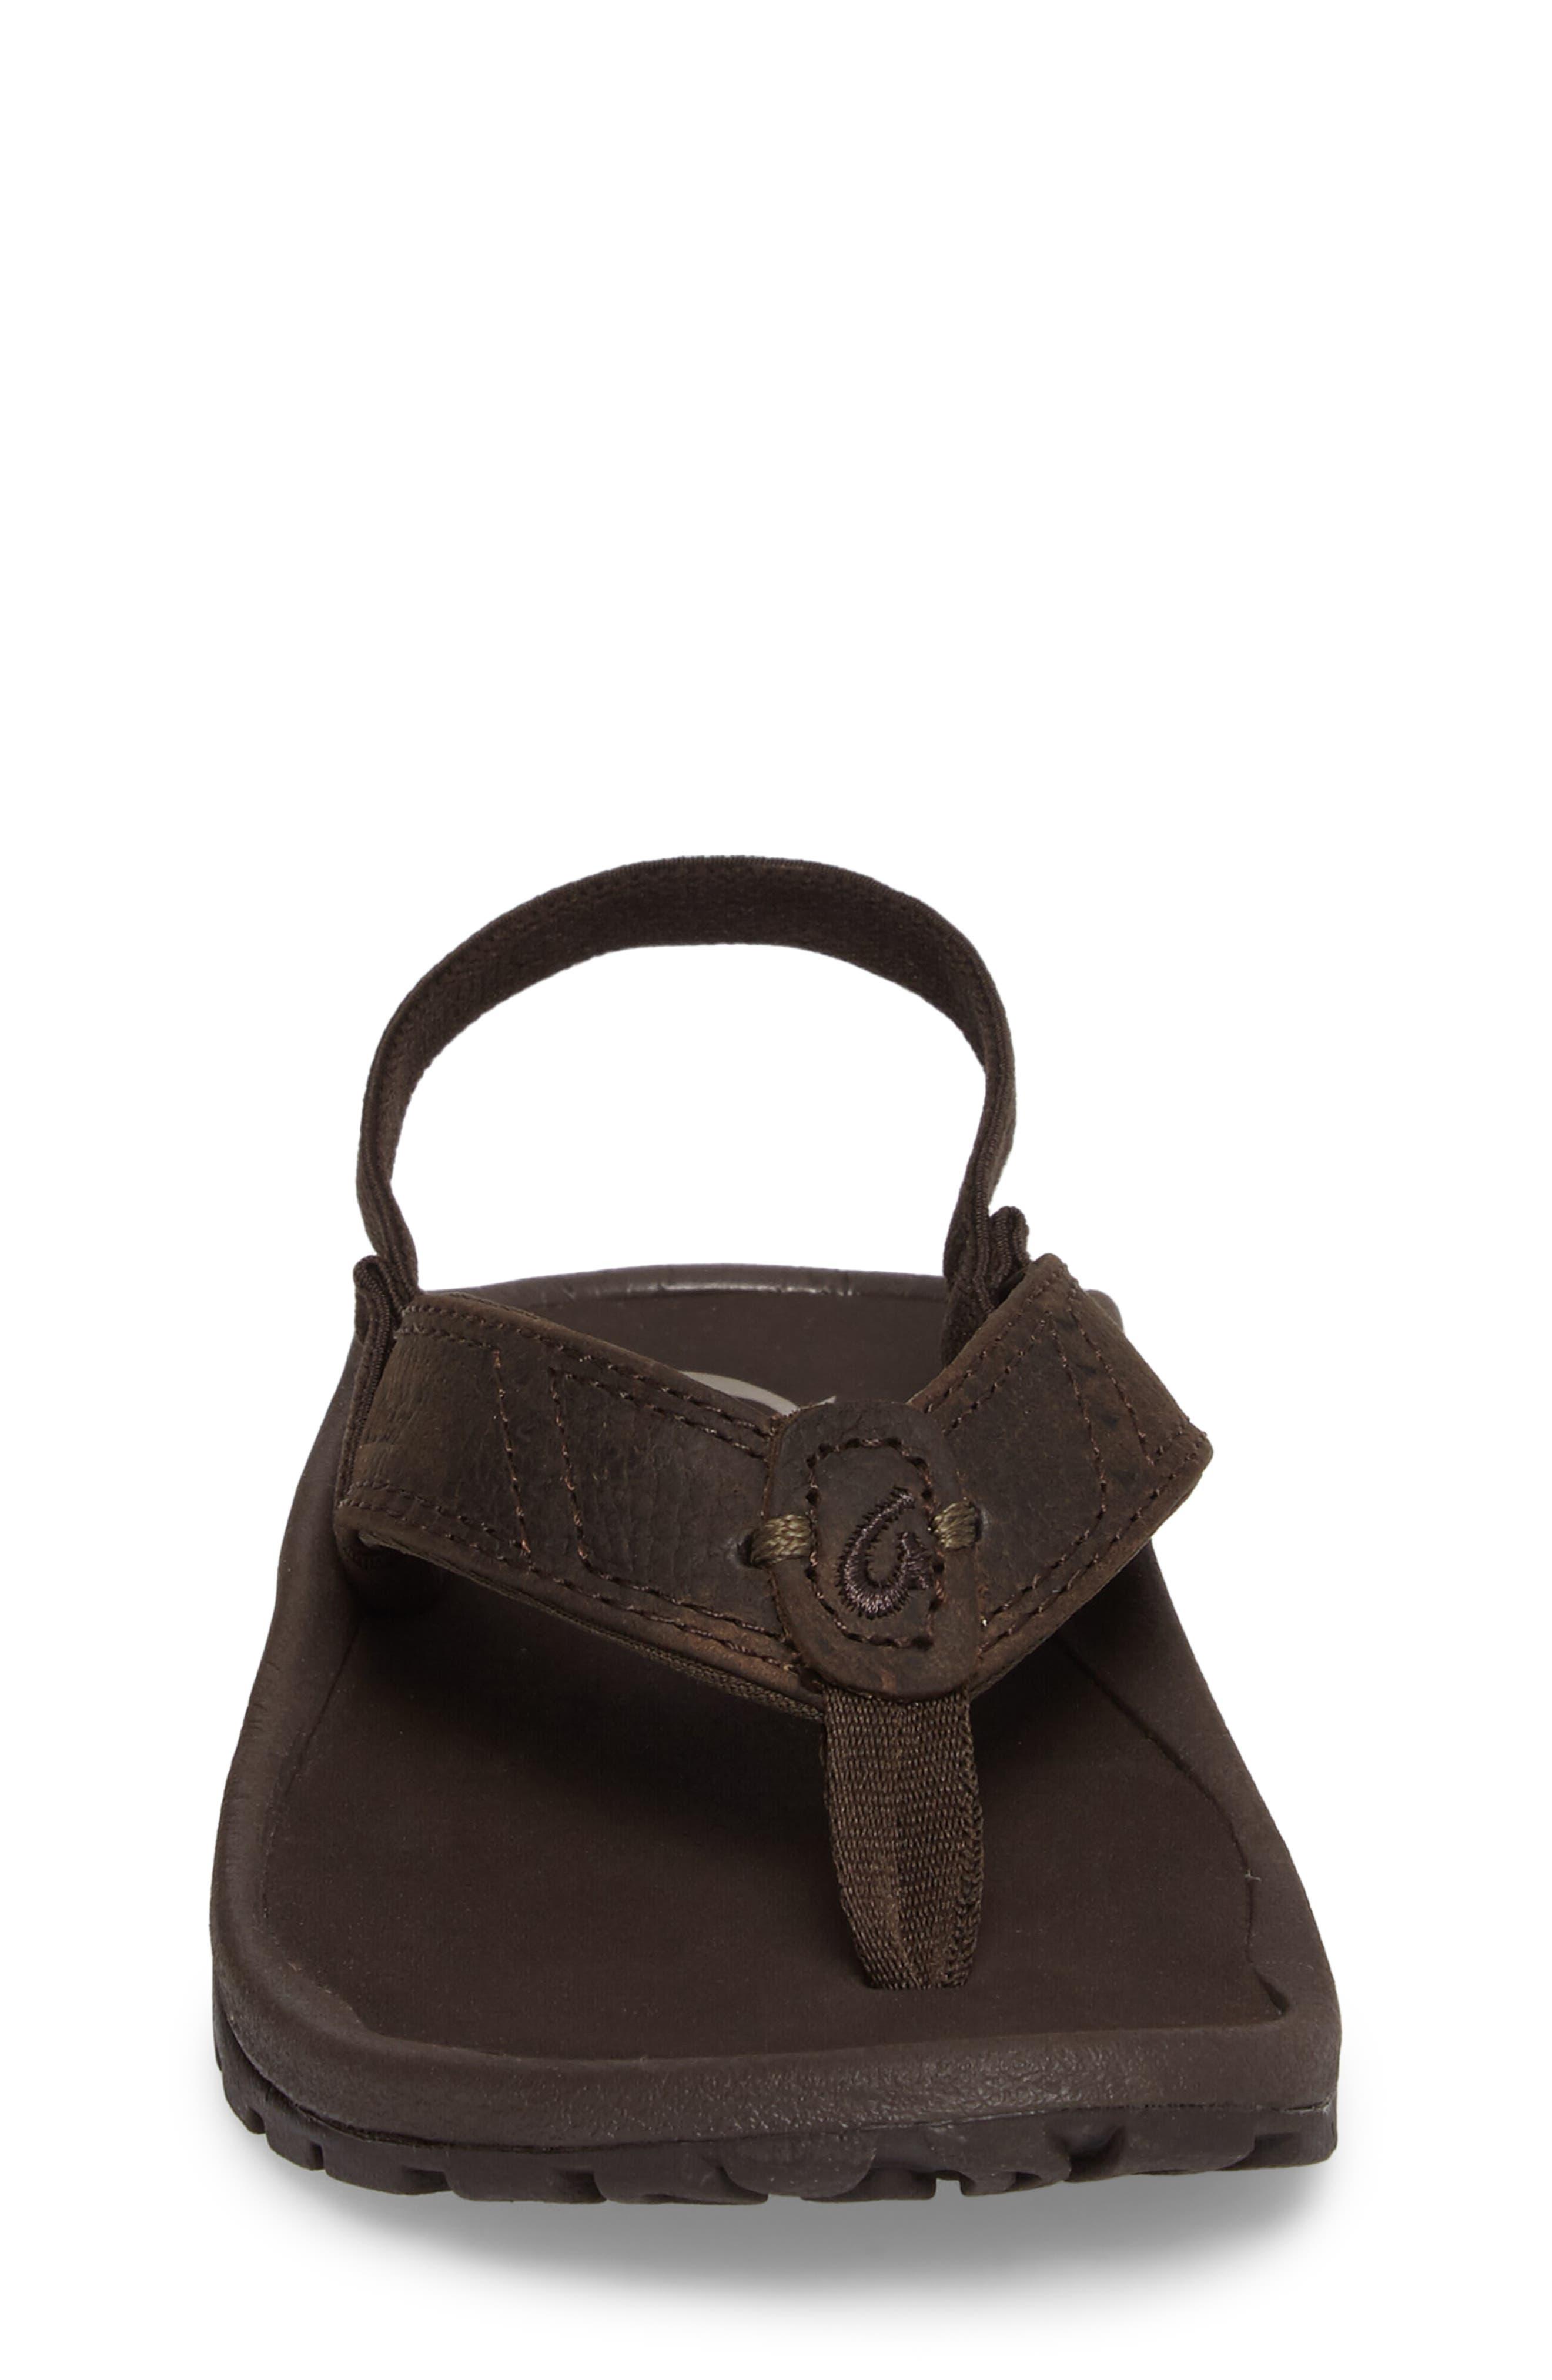 OLUKAI,                             Nui Leather Sandal,                             Alternate thumbnail 4, color,                             SEAL BROWN/ DARK JAVA